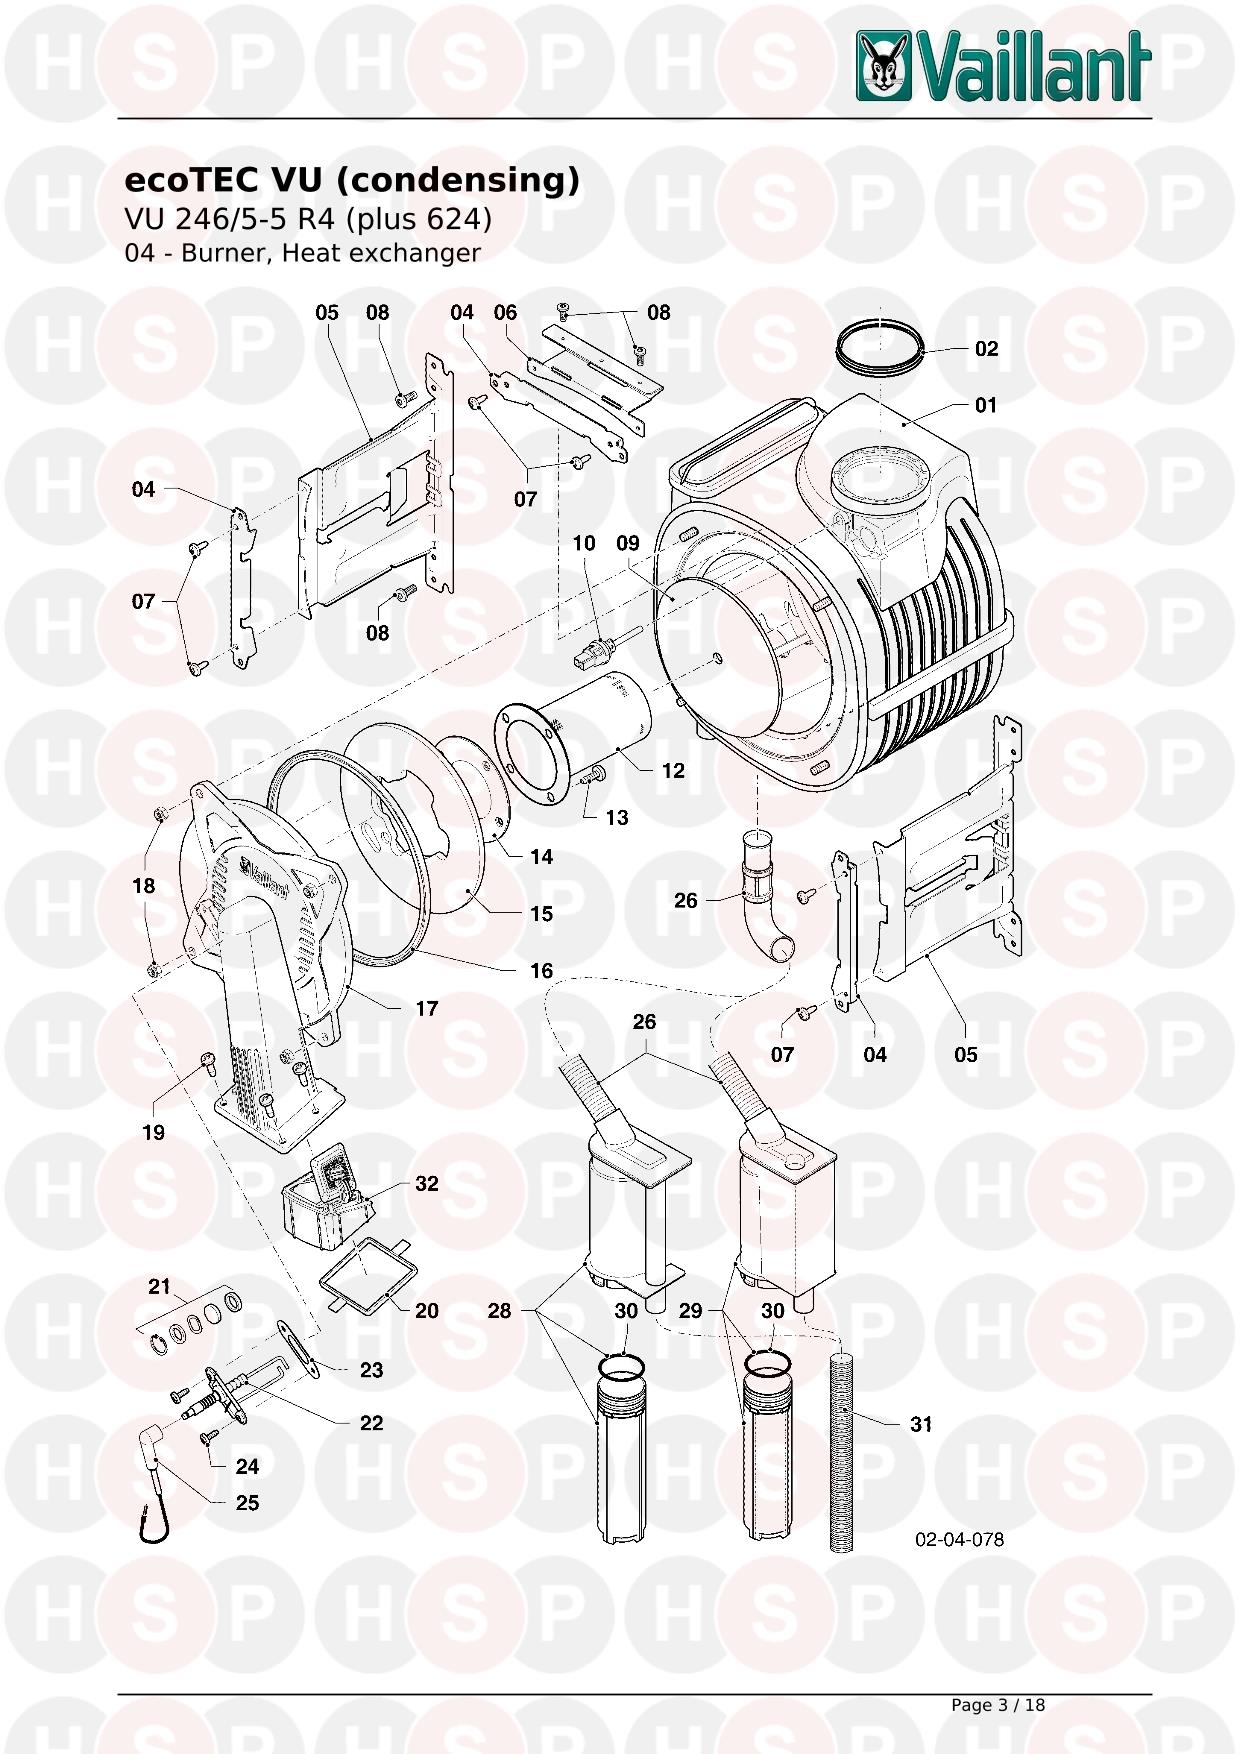 Vaillant ecotec plus 831 wiring diagram the best wiring diagram 2017 vaillant ecotec plus 624 vu 246 5 r4 2017 04 burner asfbconference2016 Gallery